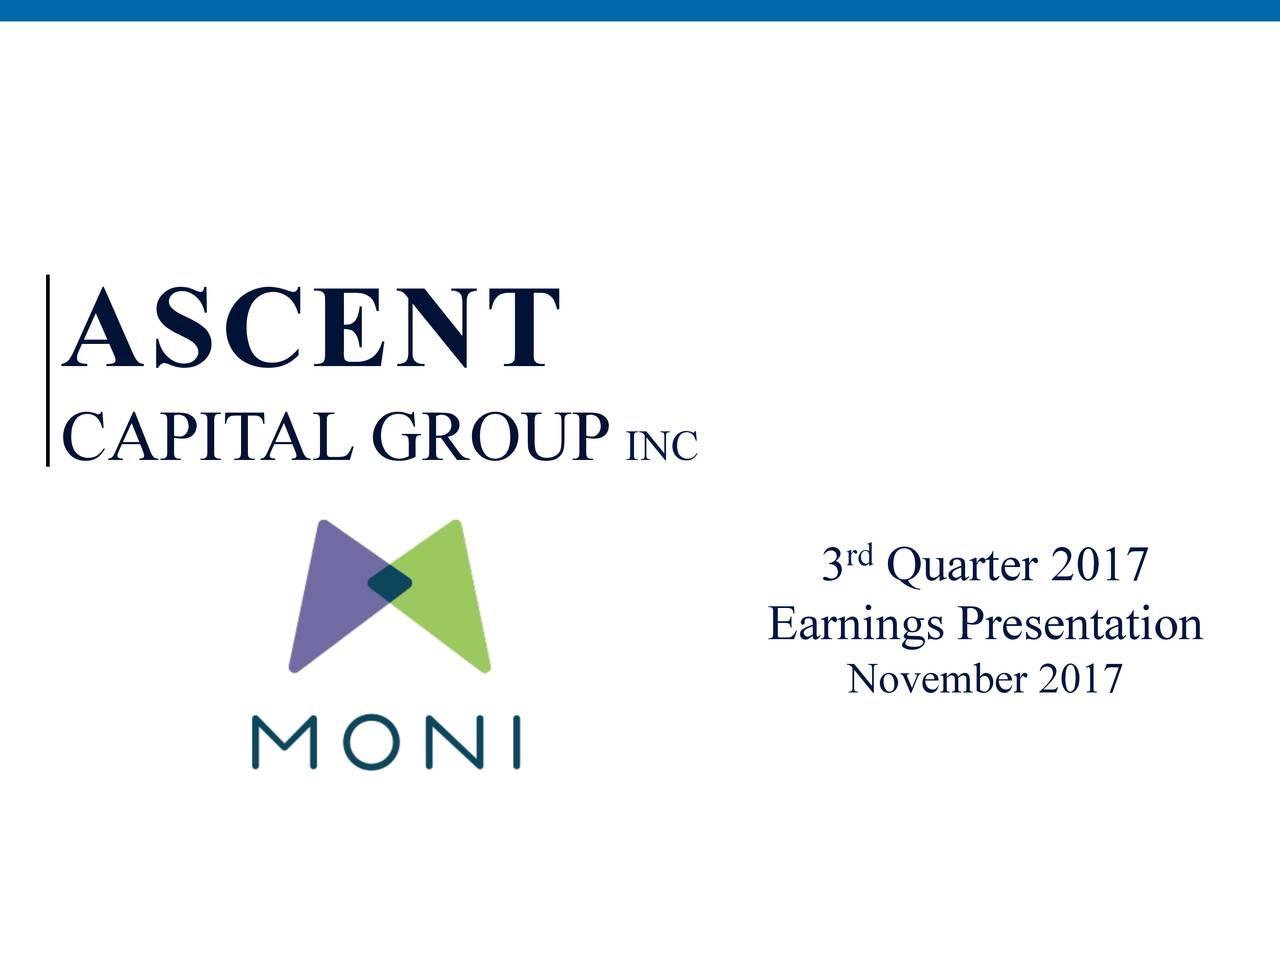 0-‐83-‐155 119-‐115-‐181 164-‐207-‐94 1-‐79-‐110 ASCENT CAPIT AL GROUP INC rd 3 Quarter 2017 Earnings Presentation November 2017